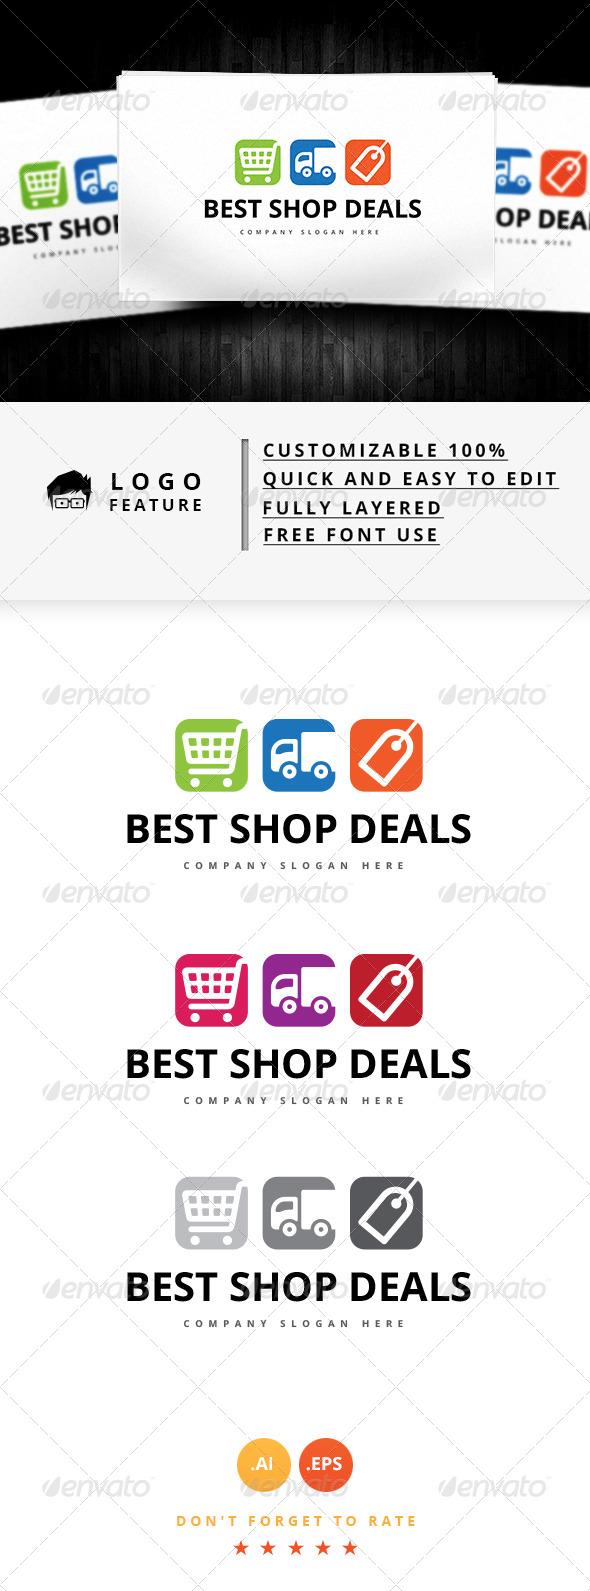 Best Shop Deals